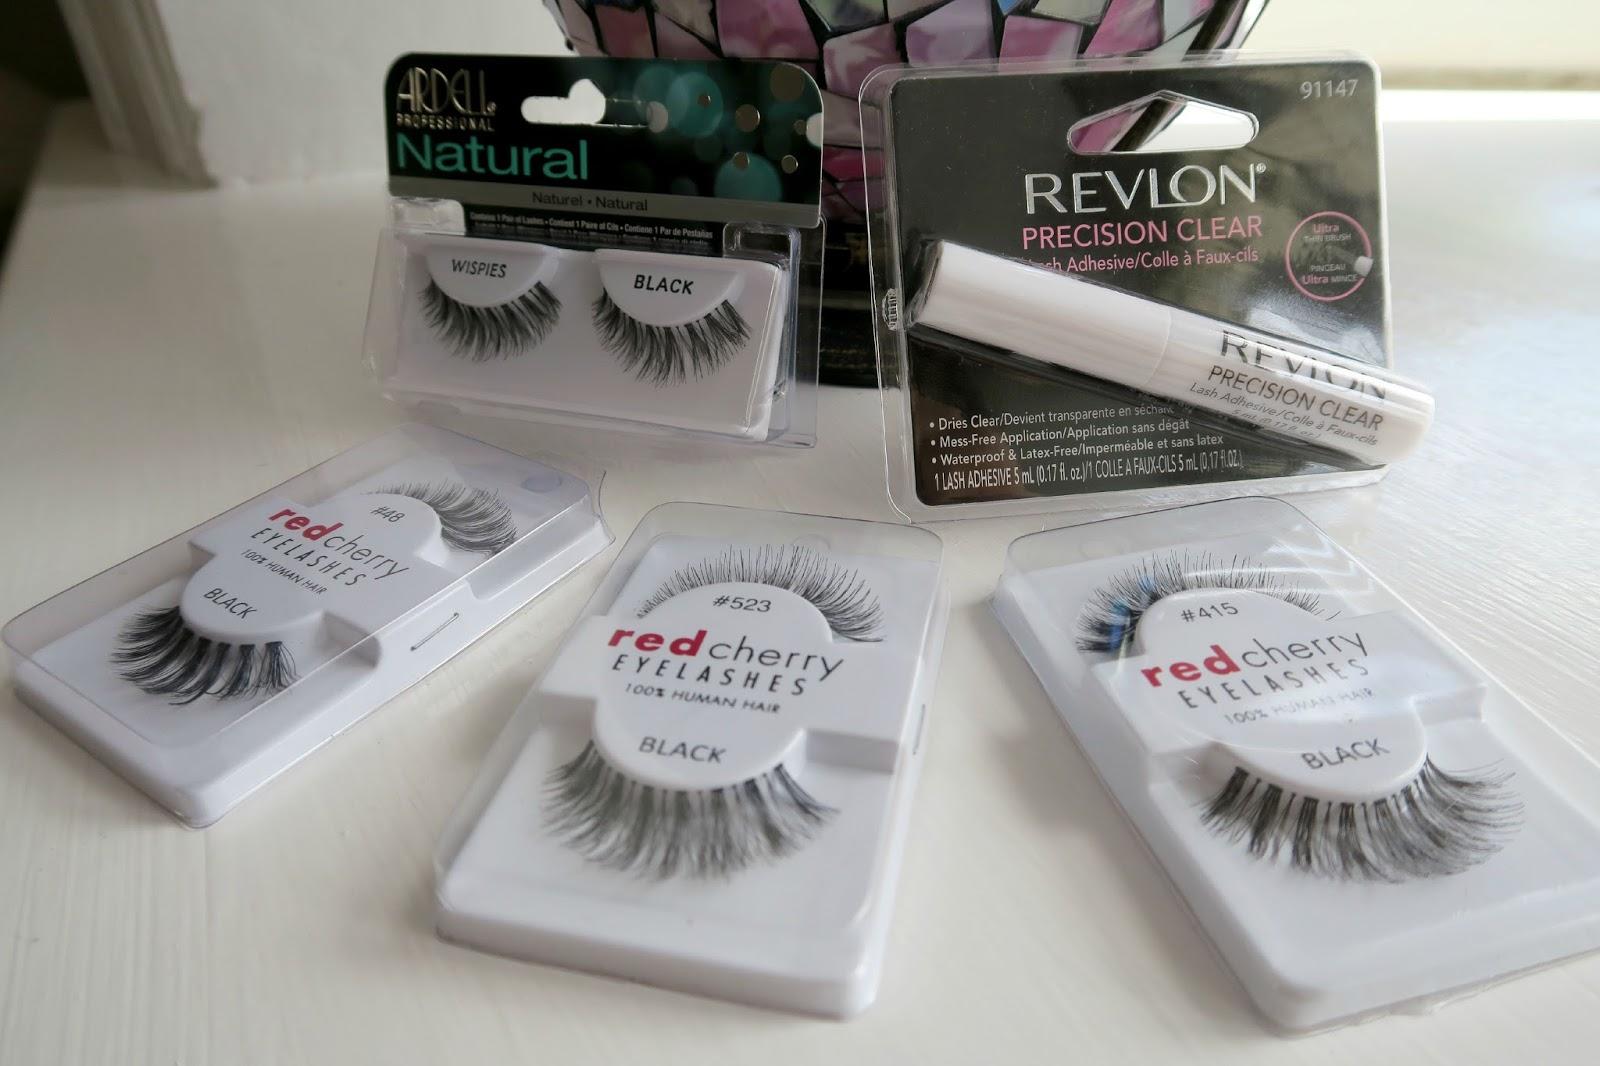 d4bddd73645 Lash Haul and Revlon Precision Clear Lash Glue Review | ALBOE by J